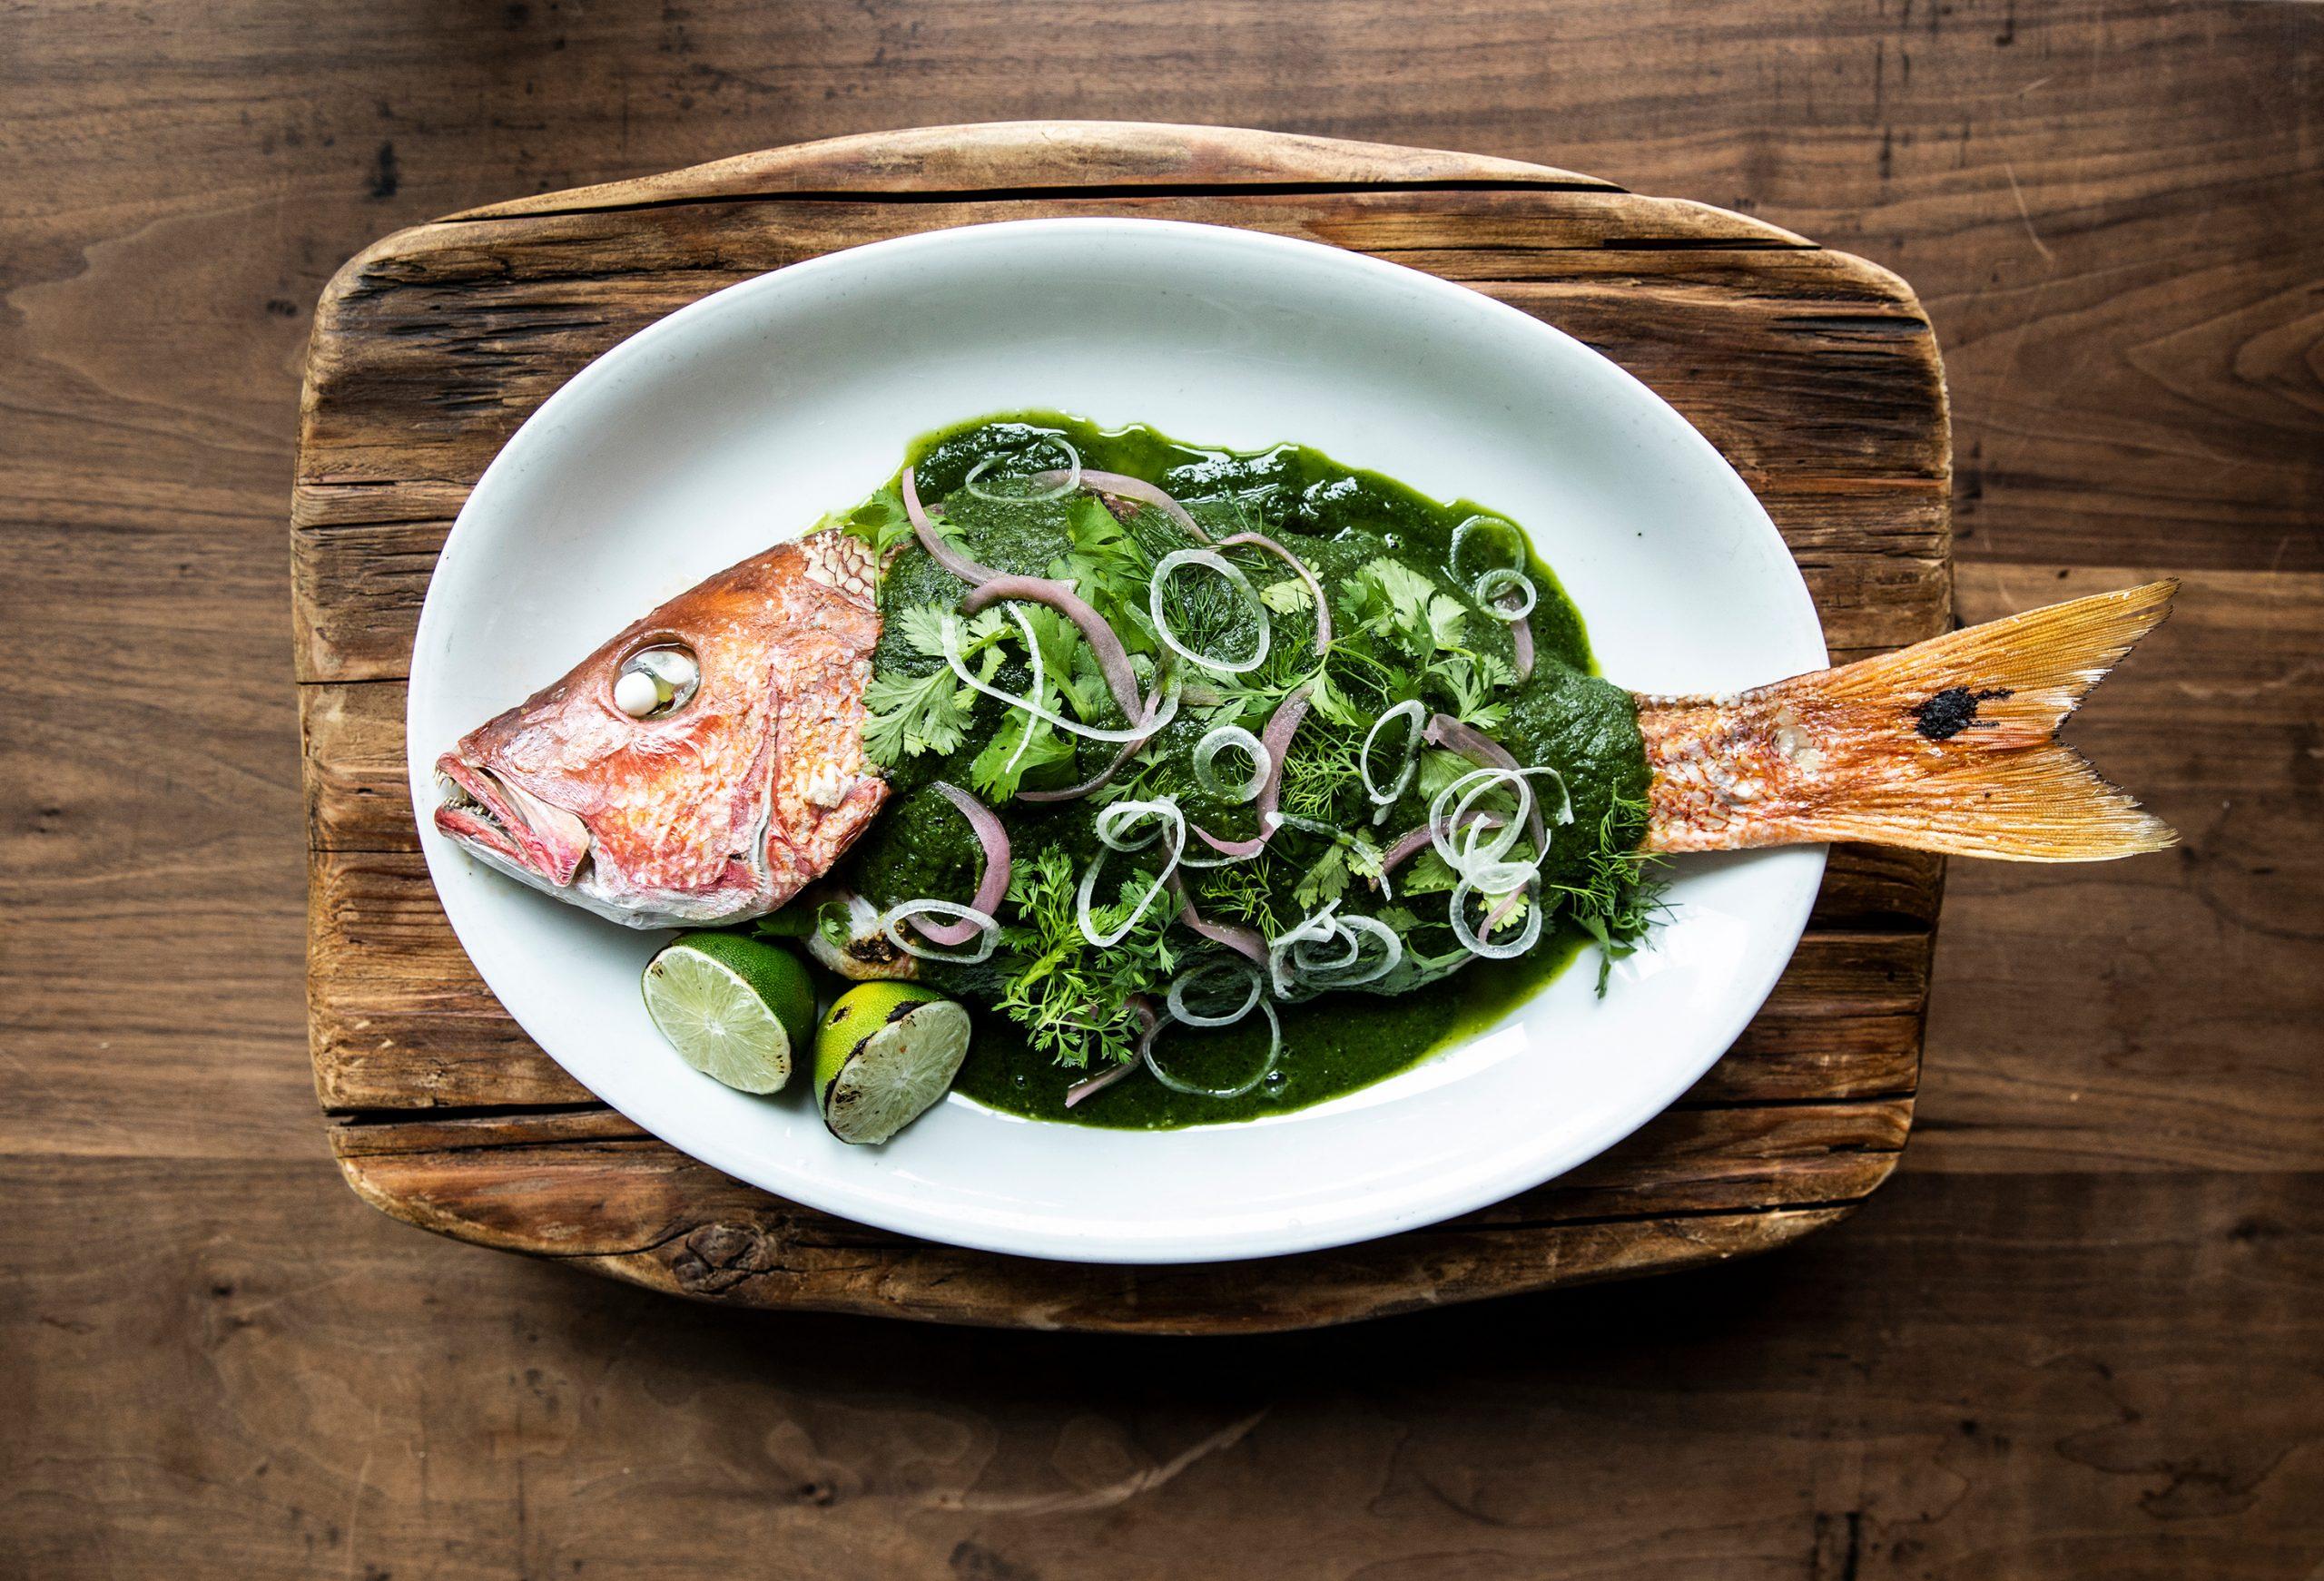 UB Preserve Culinary Photography - Julie Soefer Photography